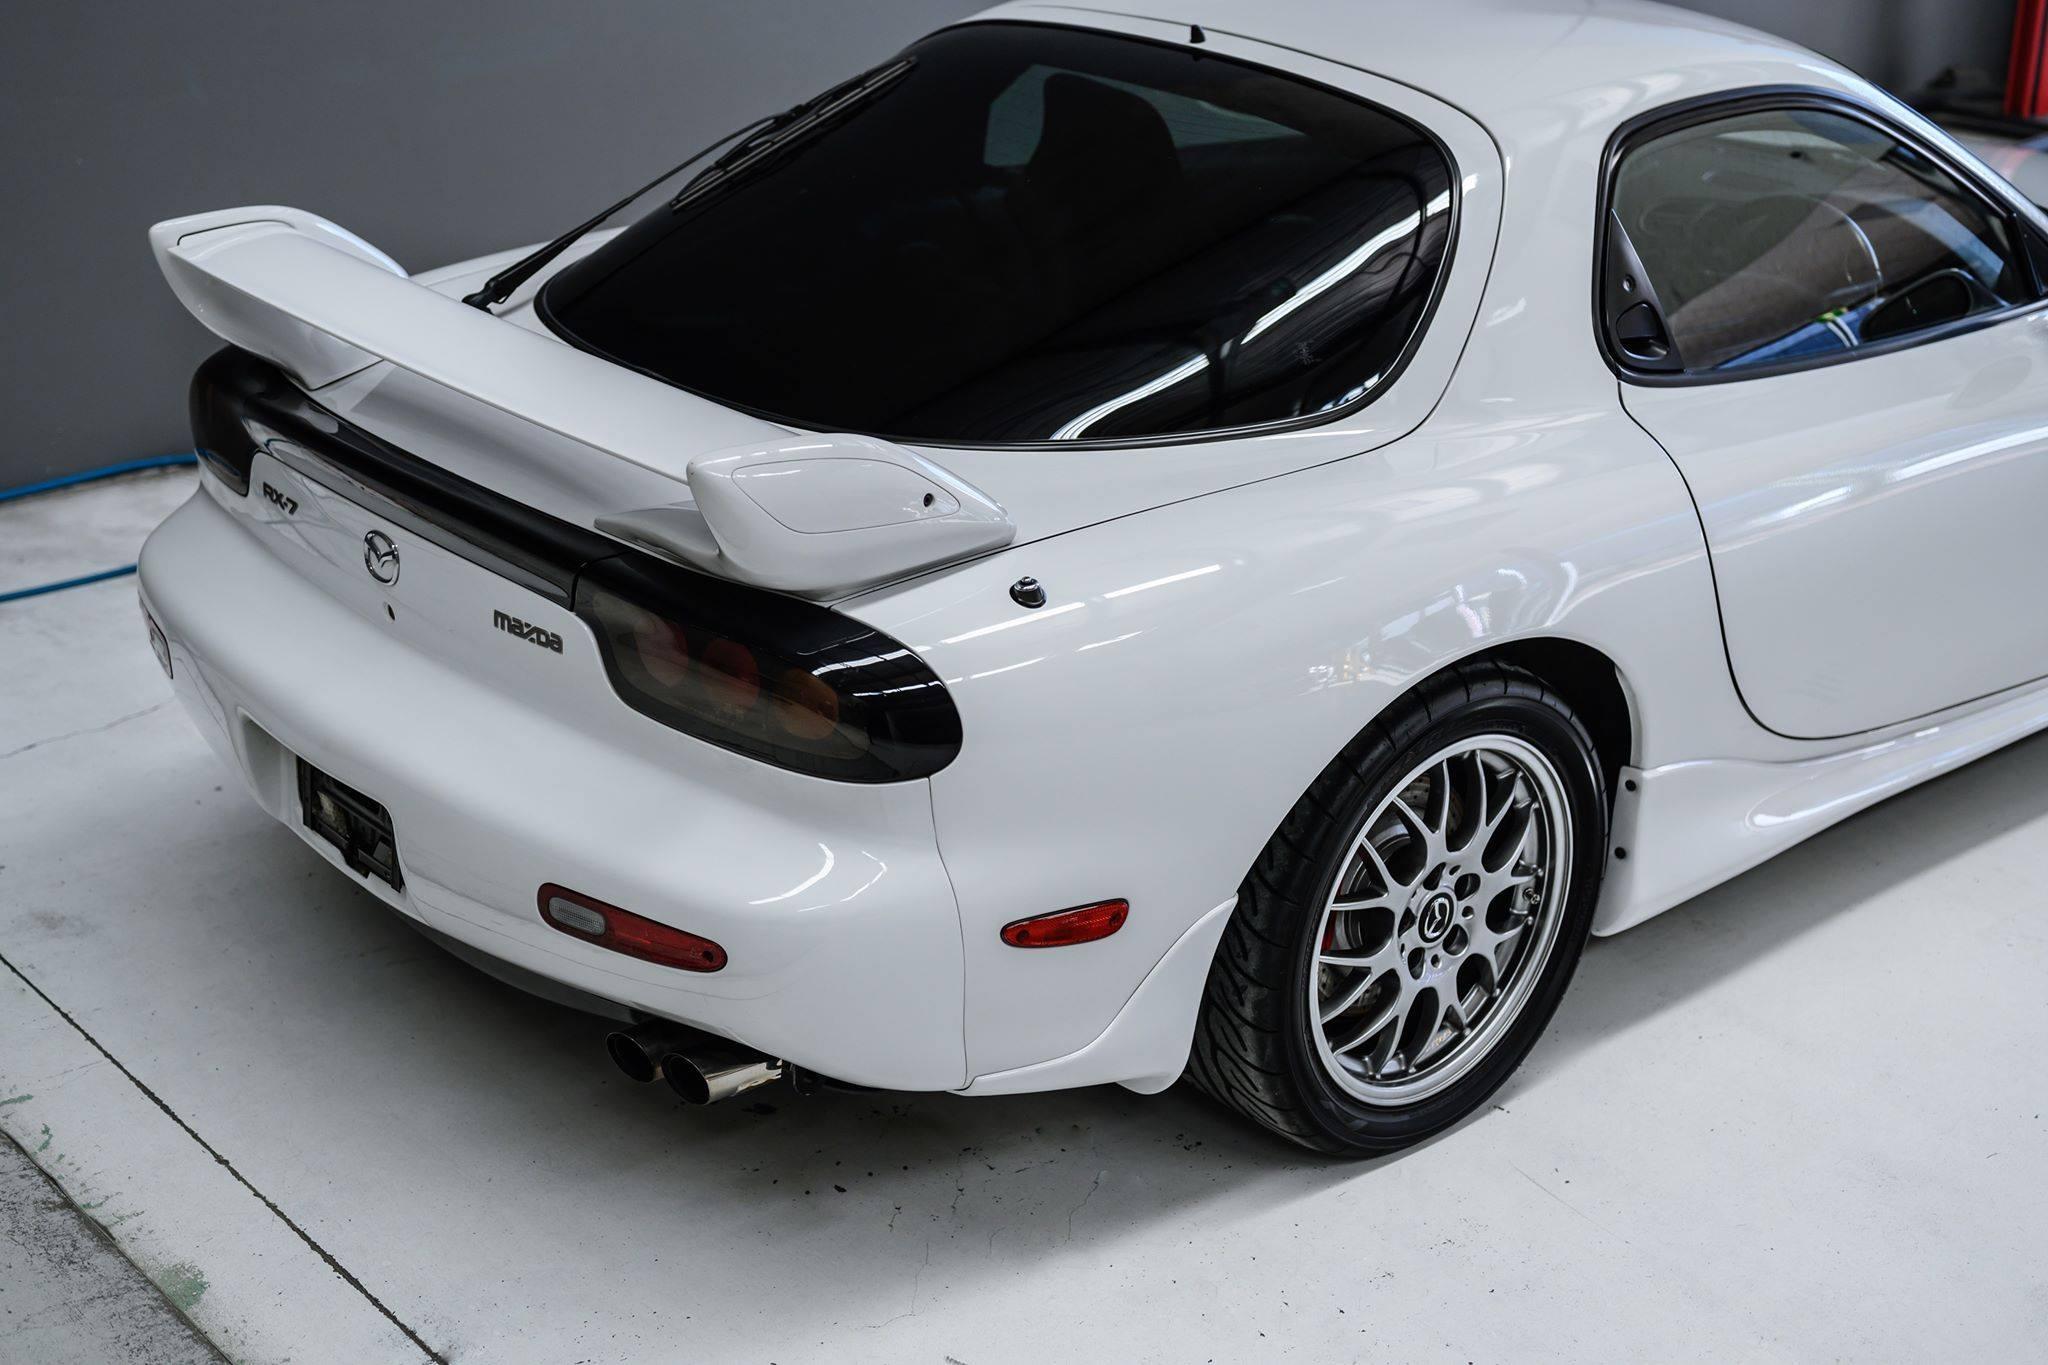 2002_Mazda_RX-7_Spirit-R_Type-A_sale_0011